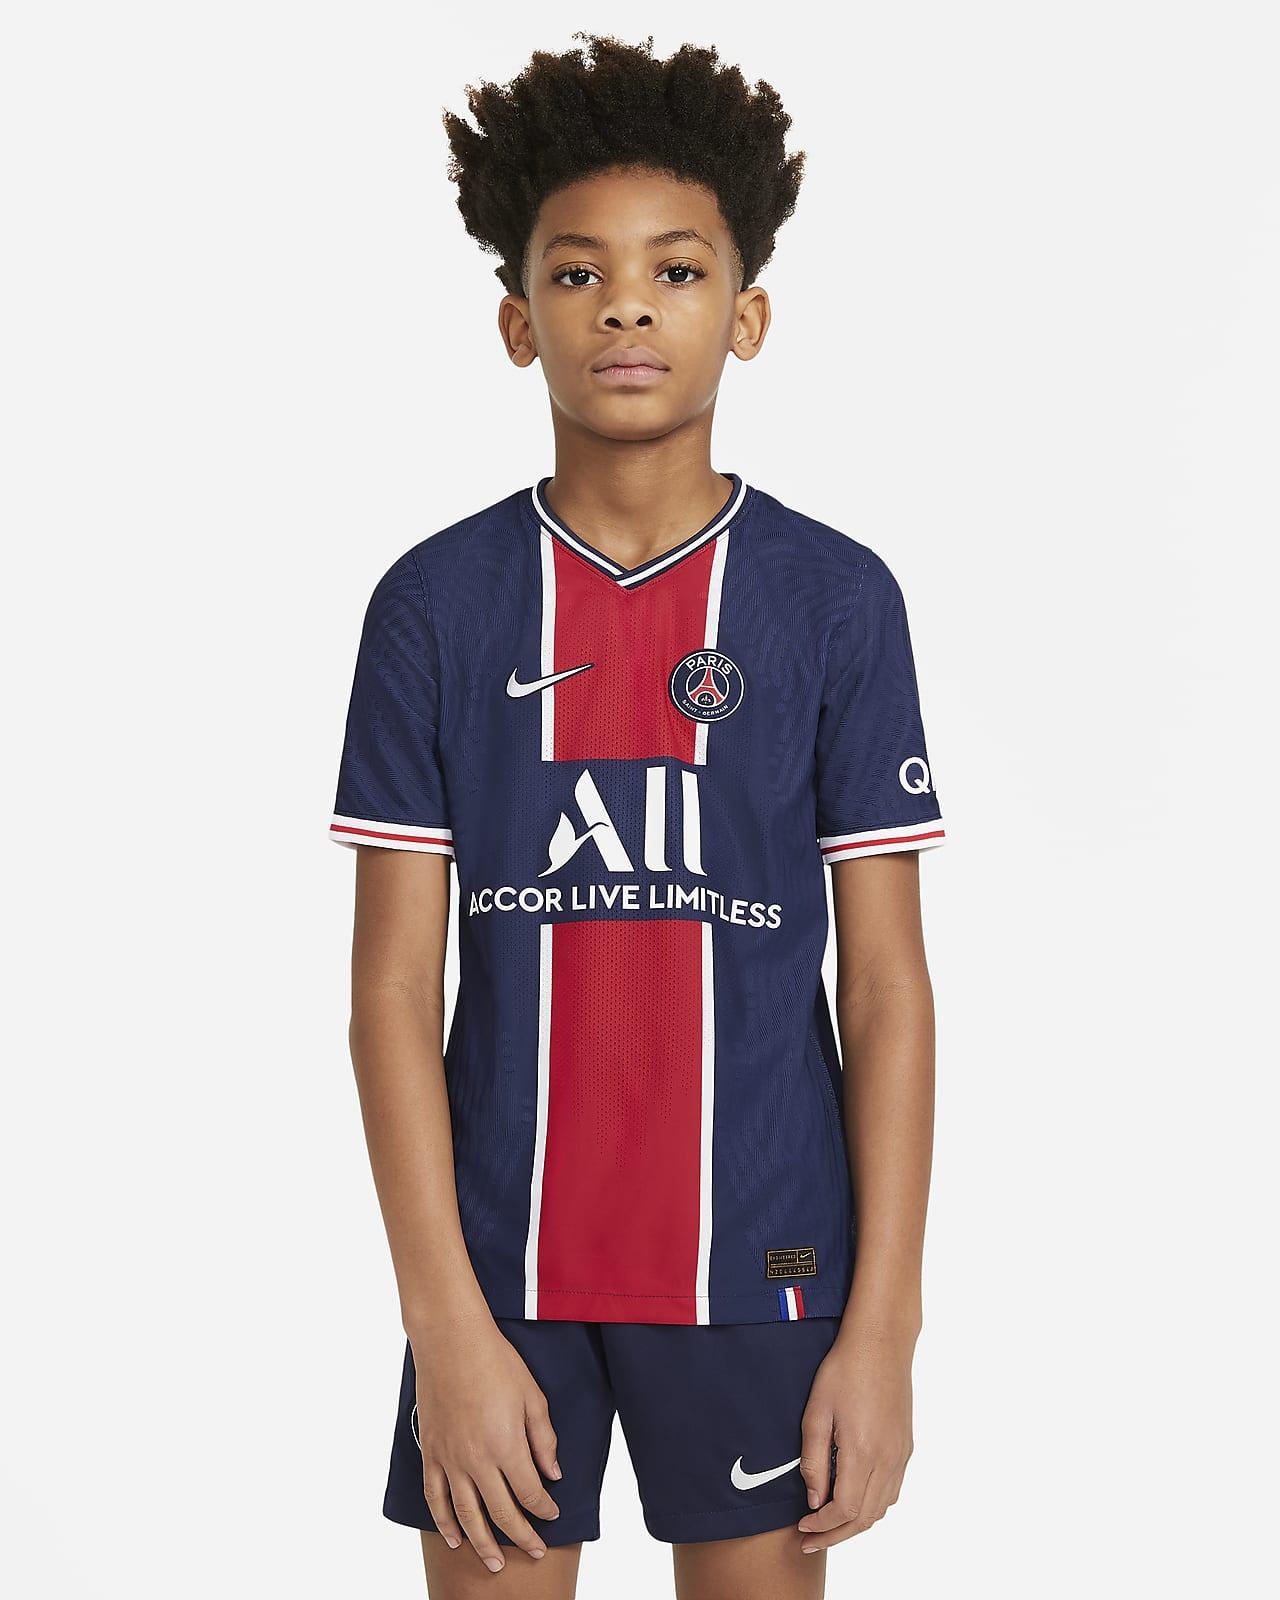 Camiseta de fútbol de local para niño talla grande Vapor Match del Paris Saint-Germain 2020/21